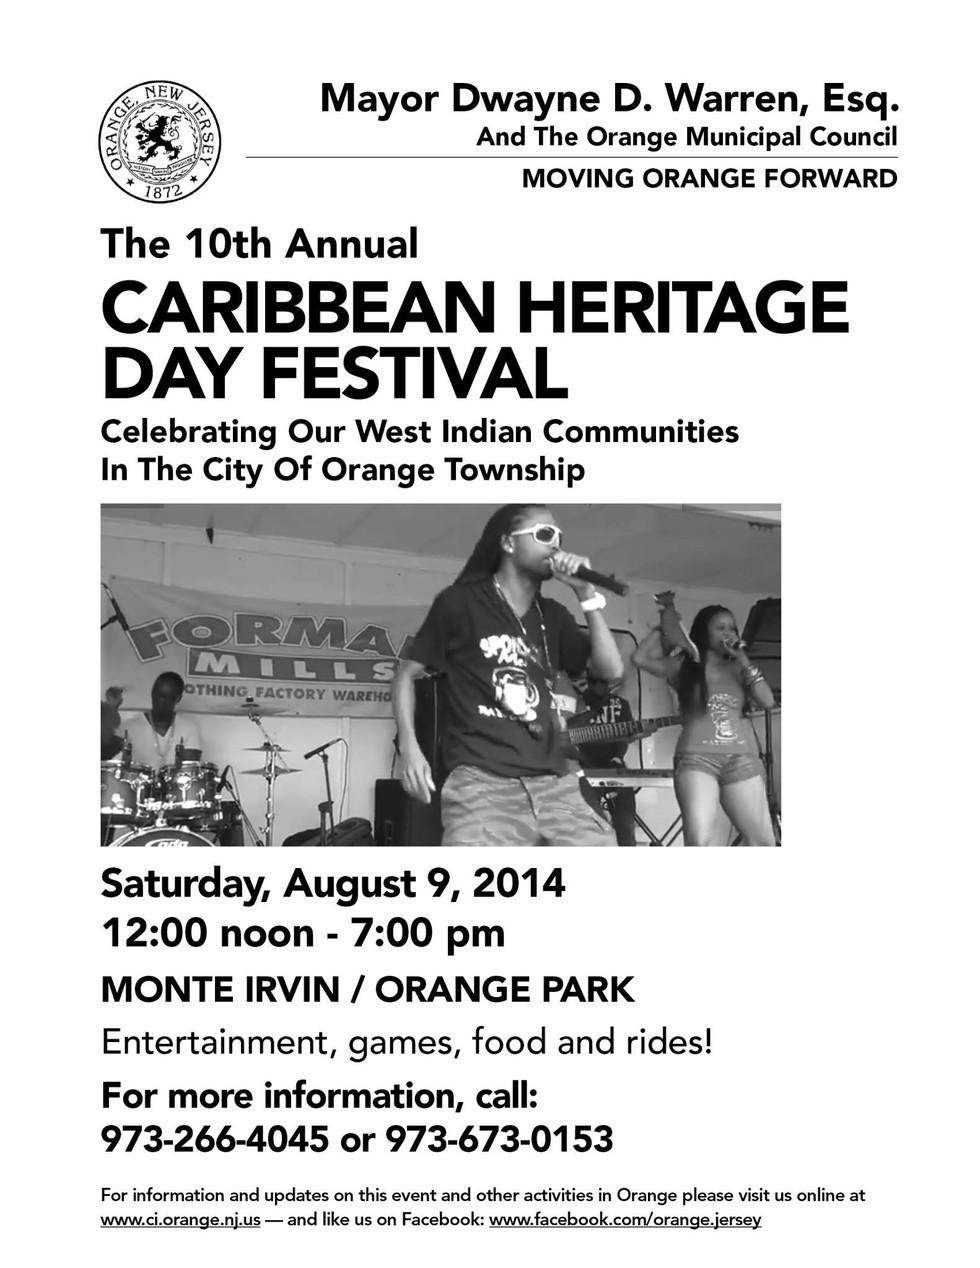 9a69180f7a439ec47449_Caribbean_festival_2.jpg